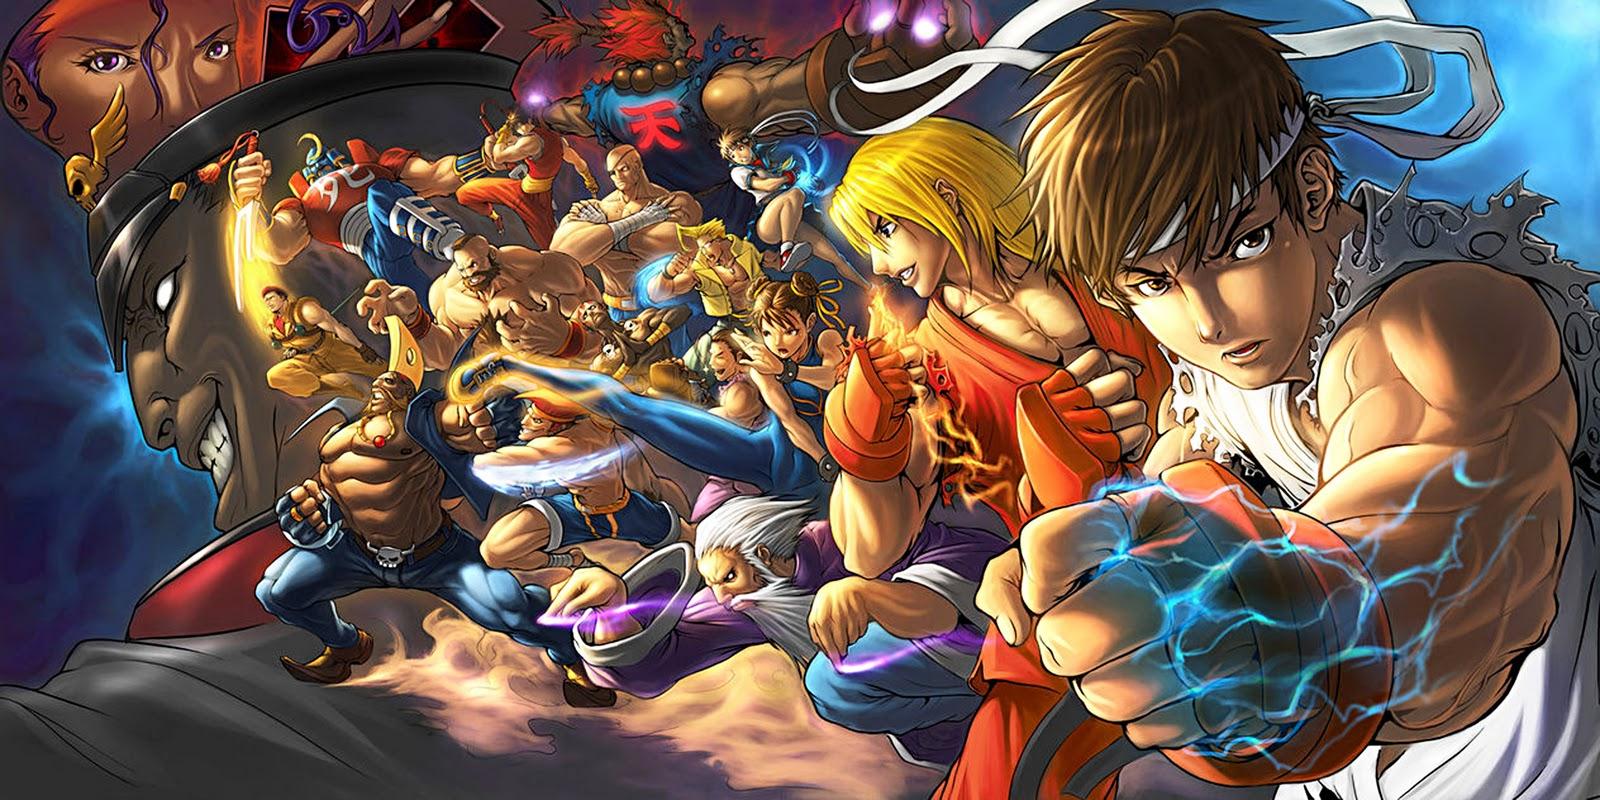 http://1.bp.blogspot.com/-zO61ZqgE80c/Tr9pUx3RoMI/AAAAAAAACLo/Scip3QO05MA/s1600/super+StreetFighter+2+3+4+iv+turbo+tribute+wallpaper+sci+fi+fantasy+video+game+by+chrisnfy85+ryu+ken+chun+li+sakura+akuma+sagat+mbison+xangief.jpg